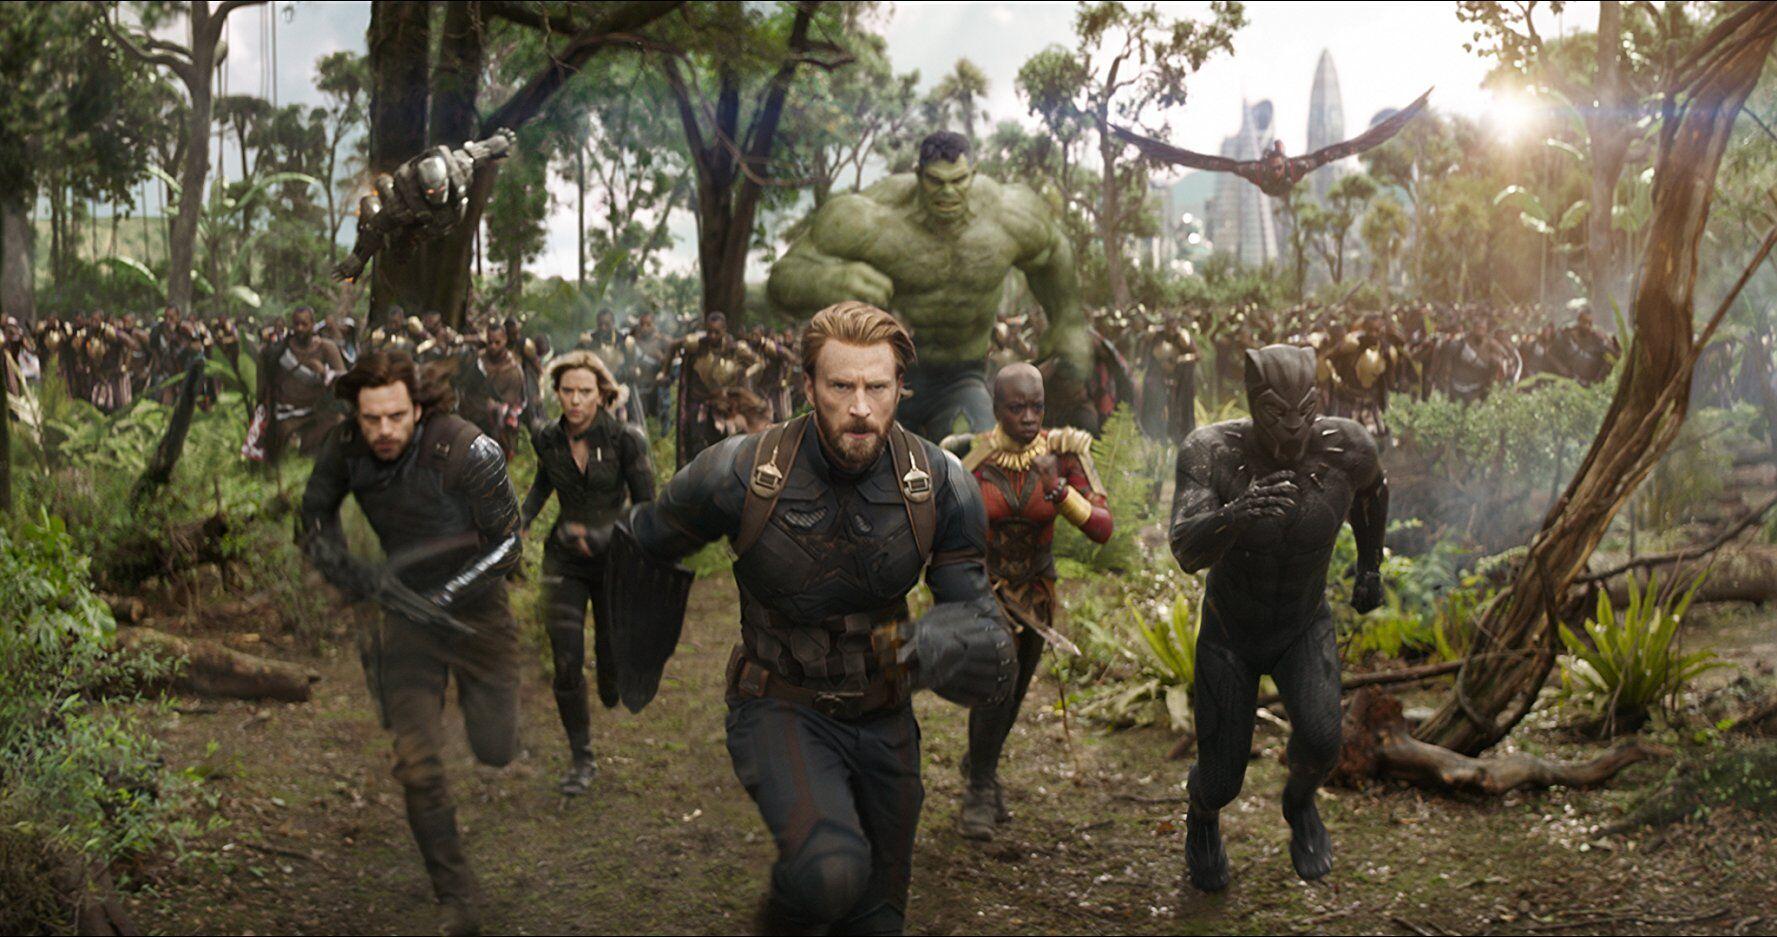 Avengers 4 concept art of Quantum Suits add context to set images